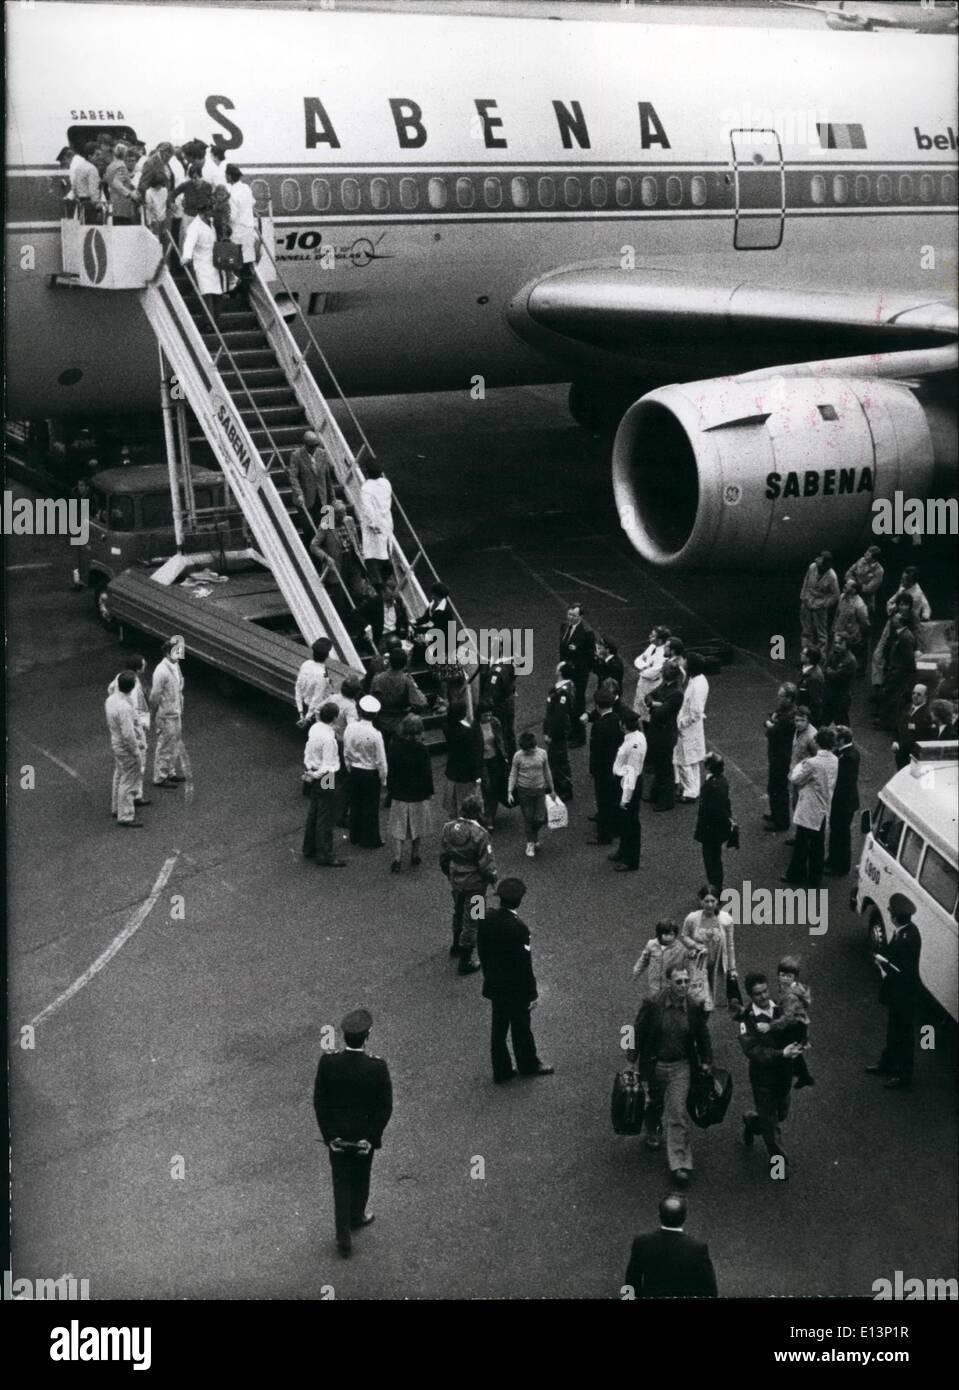 Mar. 22, 2012 - les réfugiés de Kolwezi arrivent à Bruxelles Banque D'Images